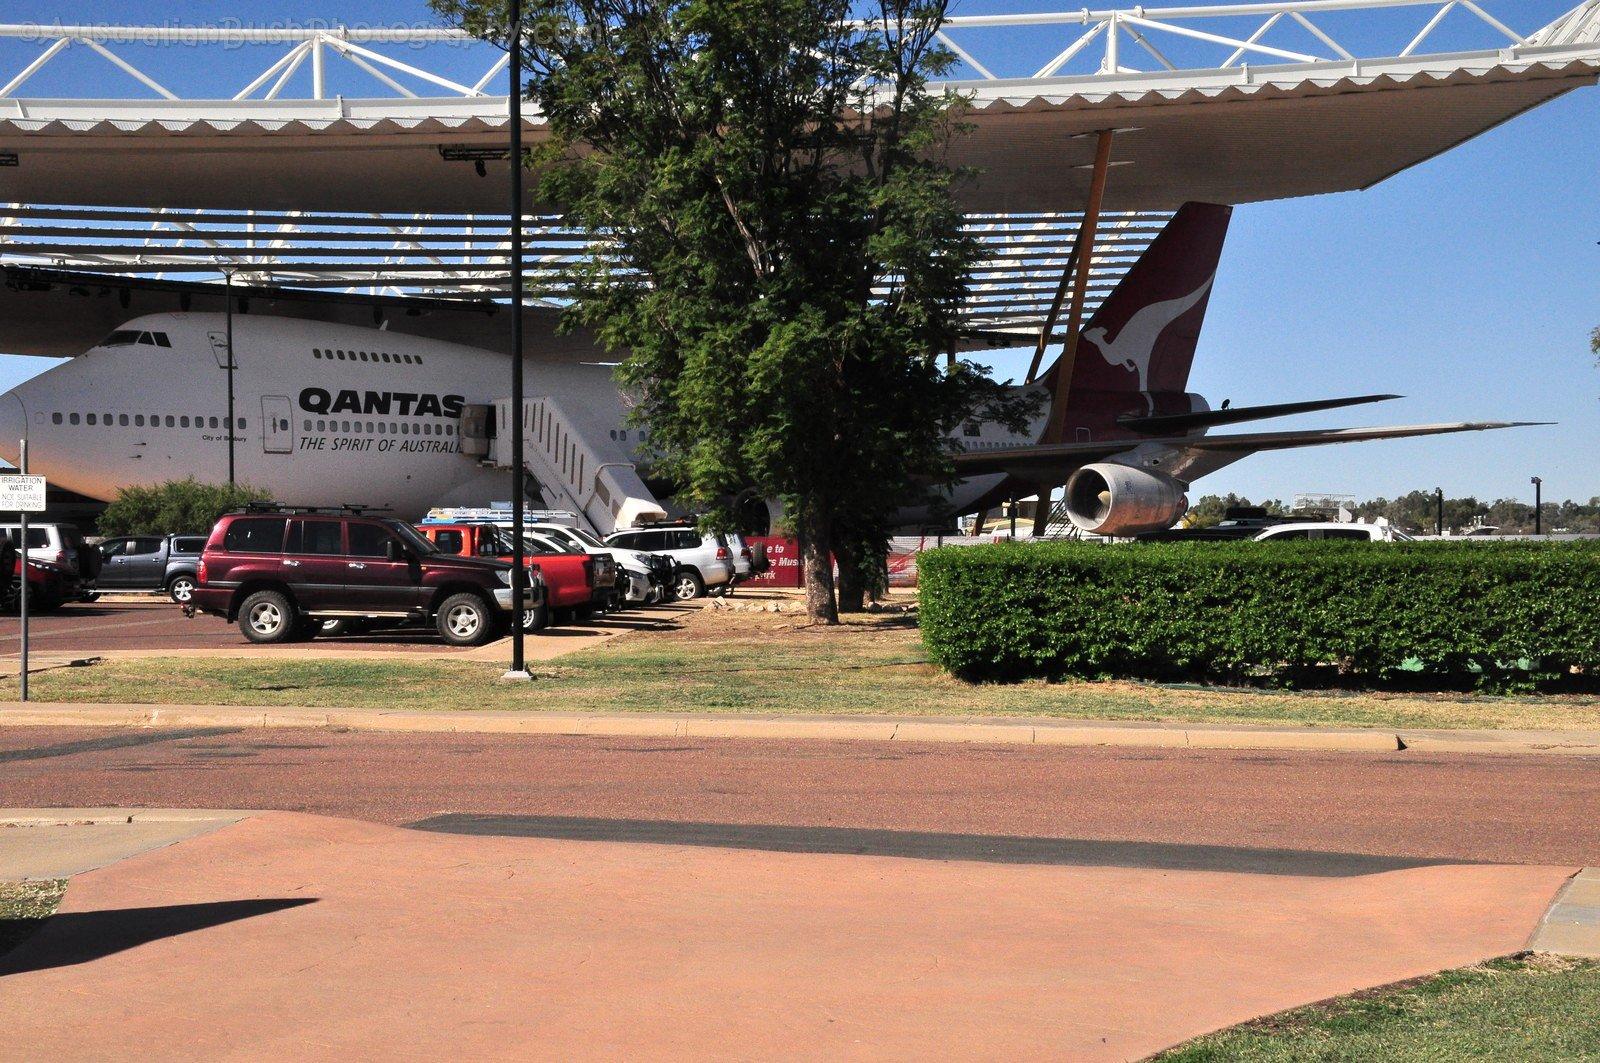 Qantas Founders Museum Longreach